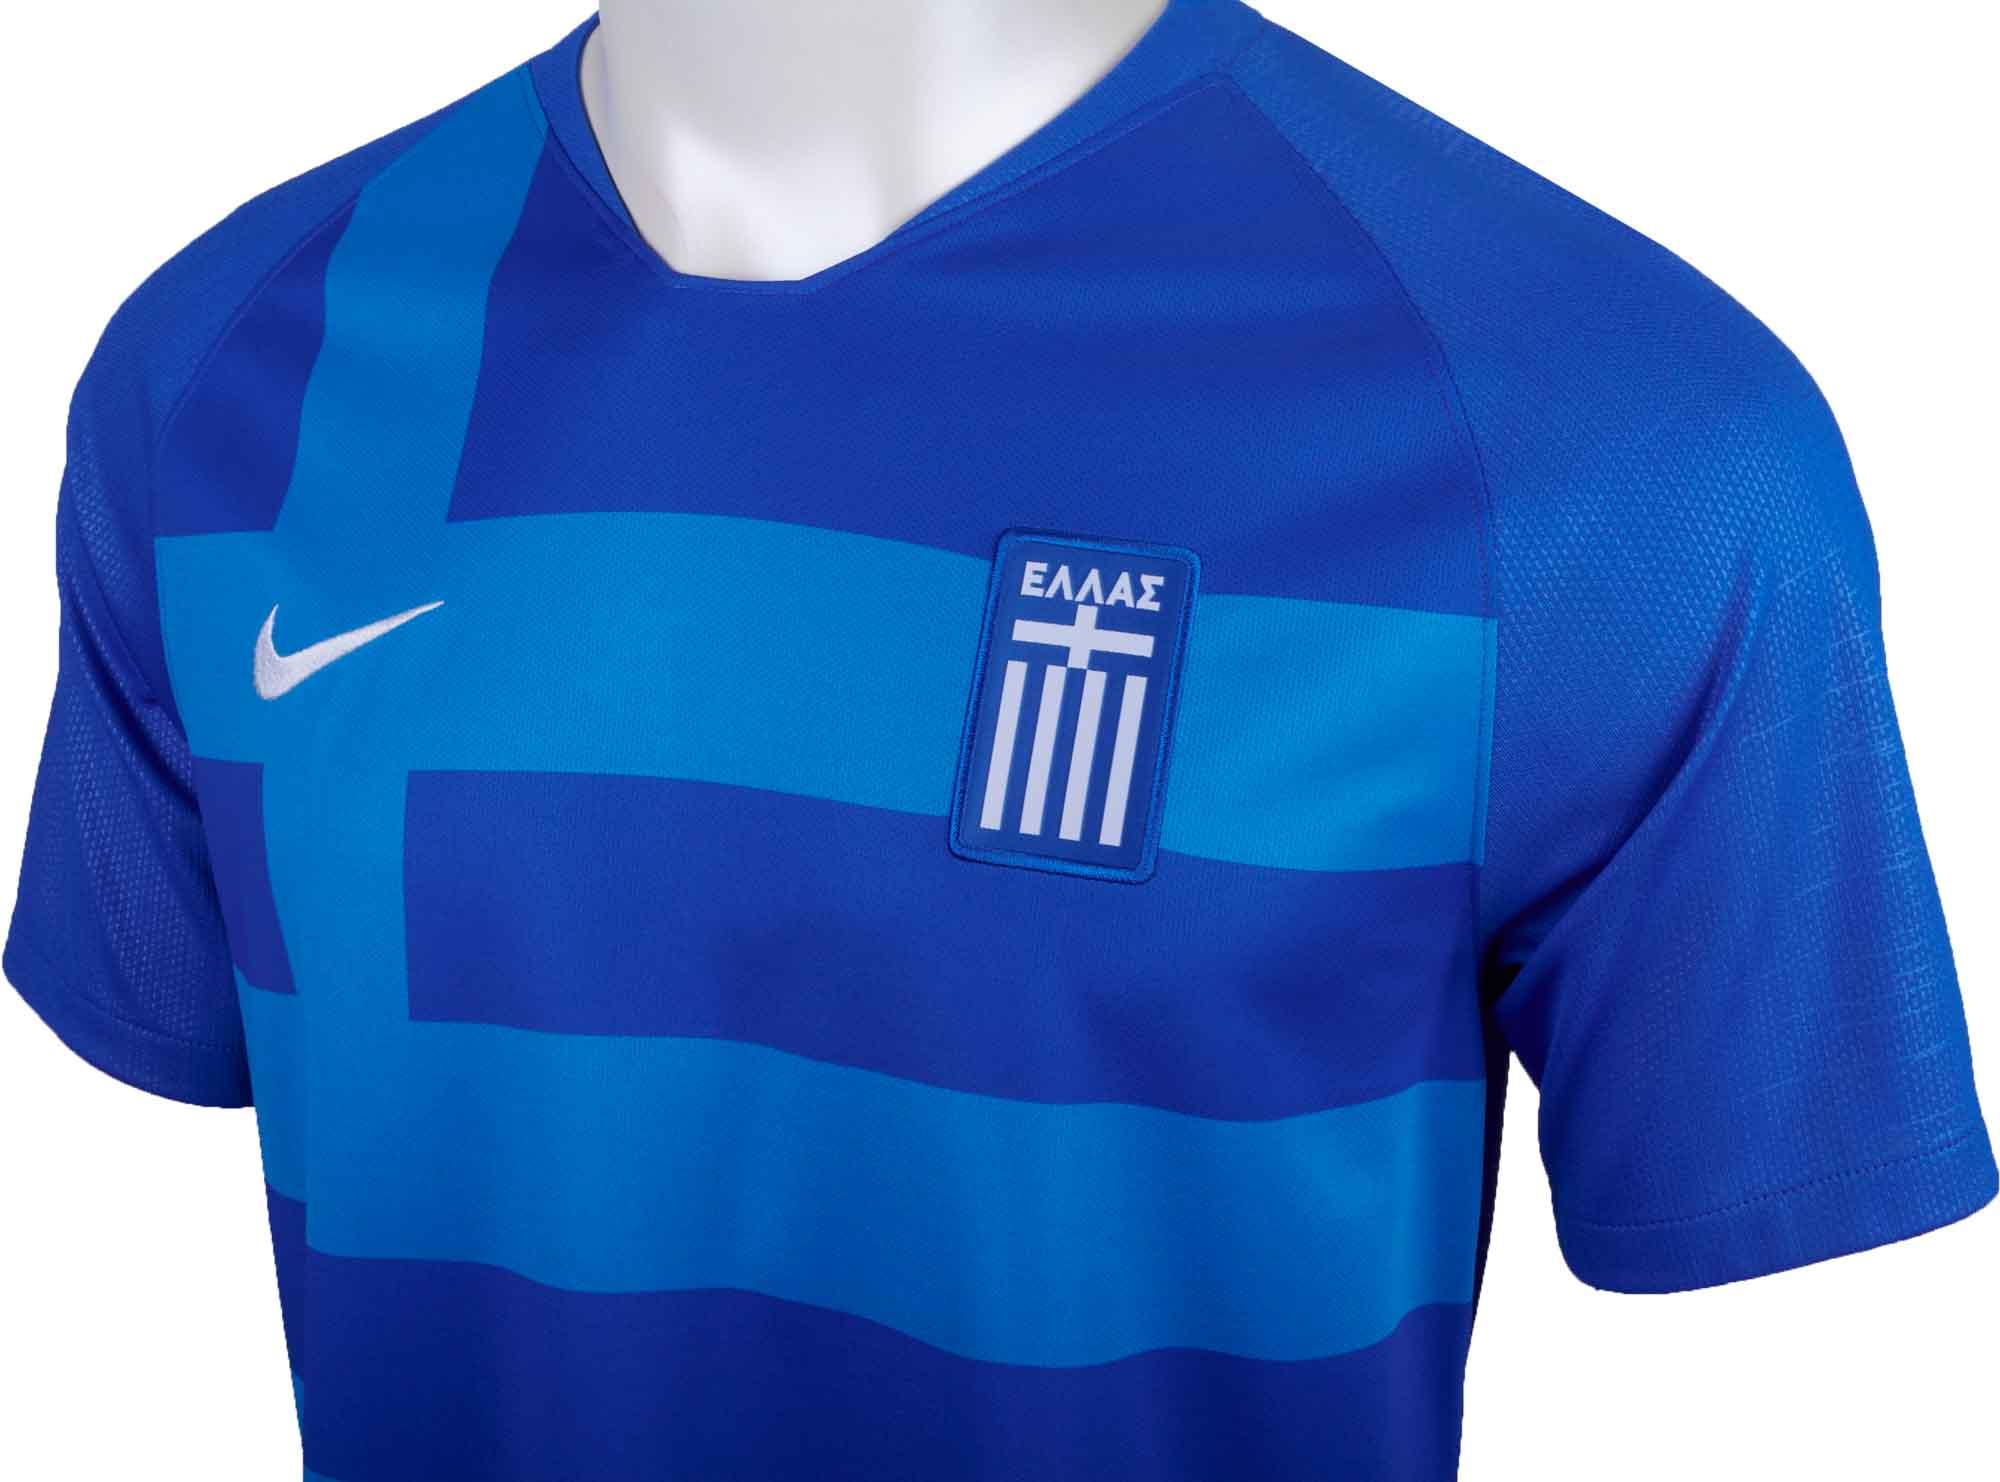 1e59d62e9 Nike Greece Away Jersey 2018-19 - SoccerPro